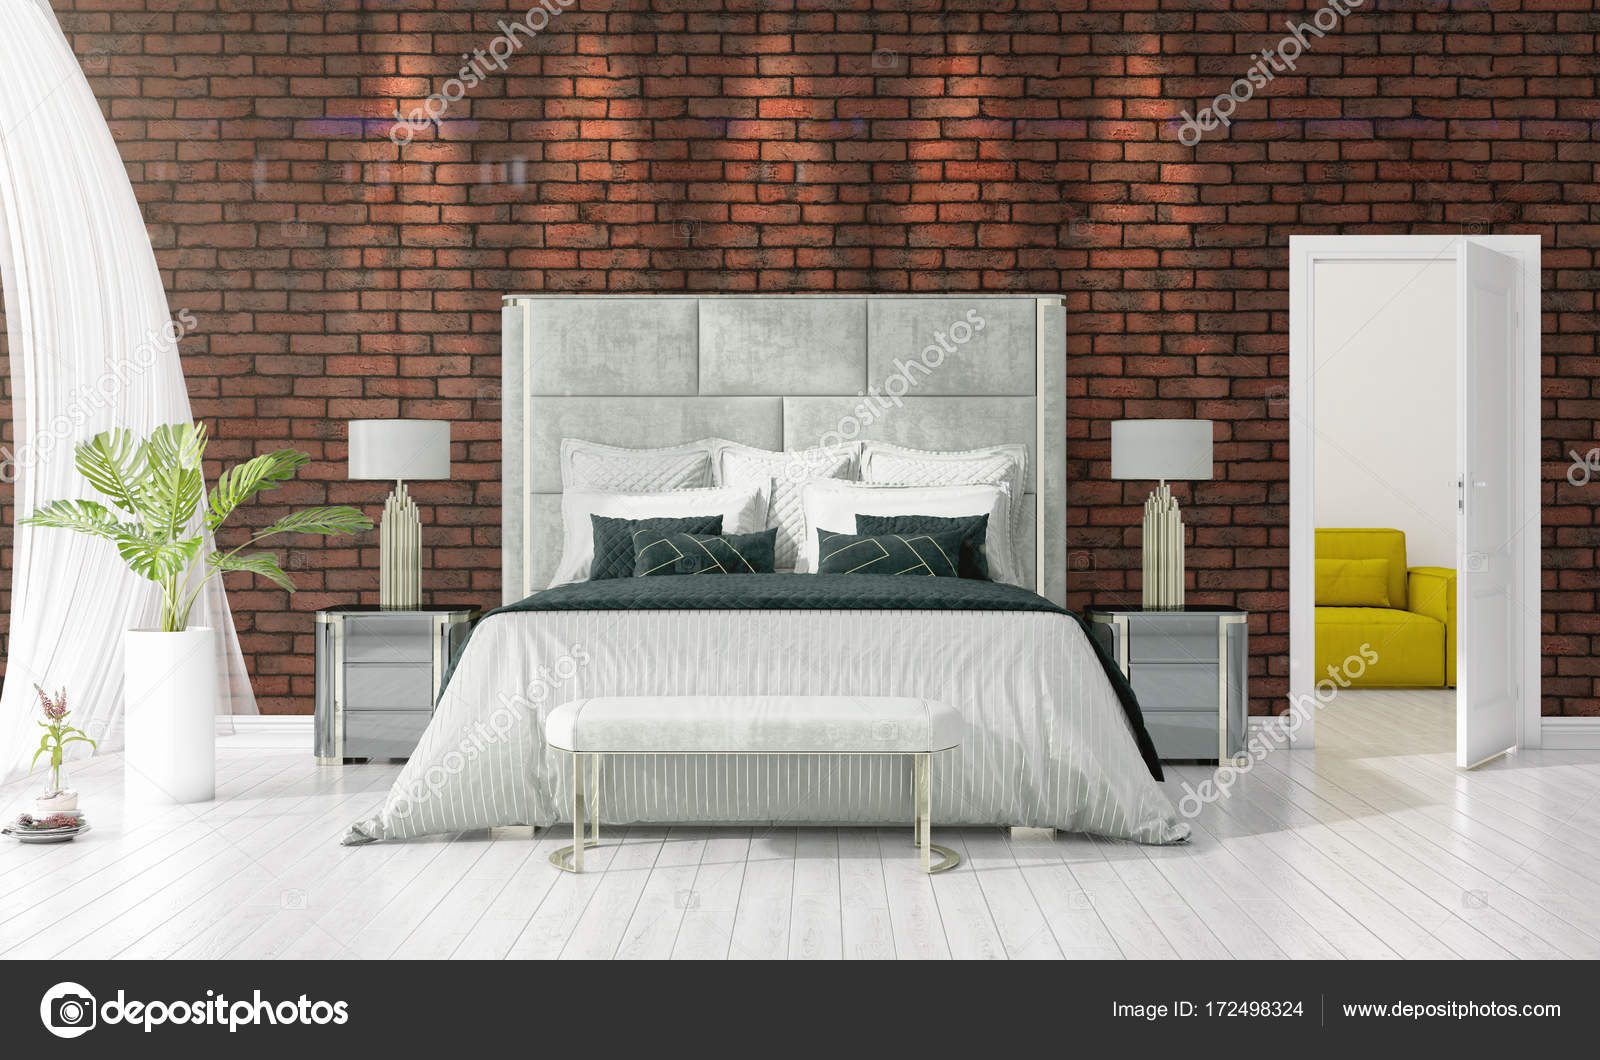 Inrichting Slaapkamer Modern : Interieur slaapkamer modern parksidetraceapartments